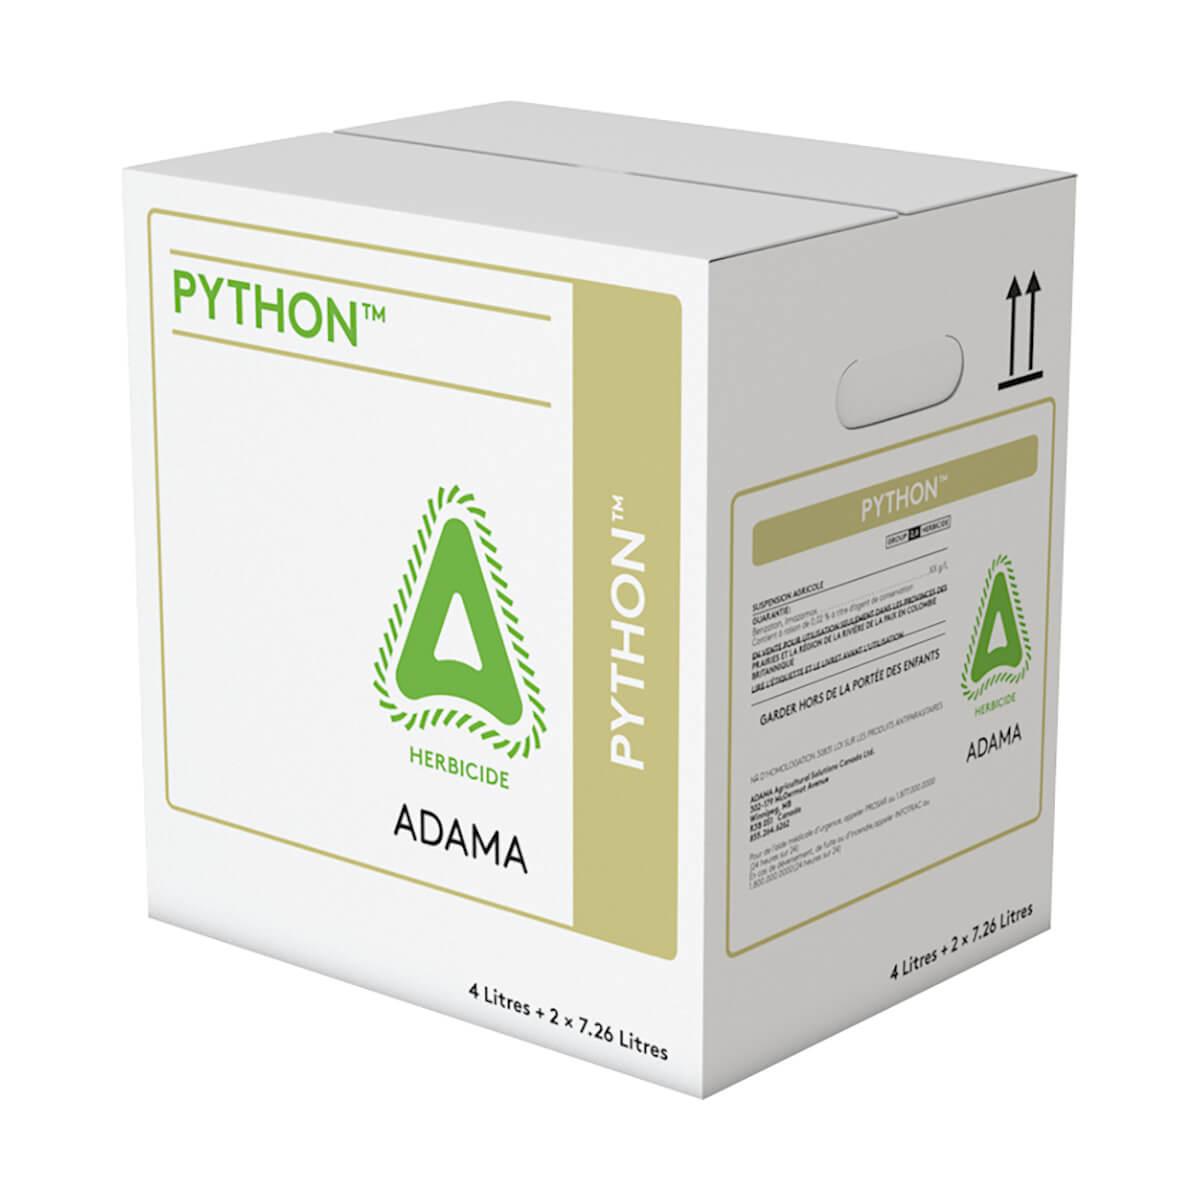 PYTHON - 4L + 2 x 7.26L Case